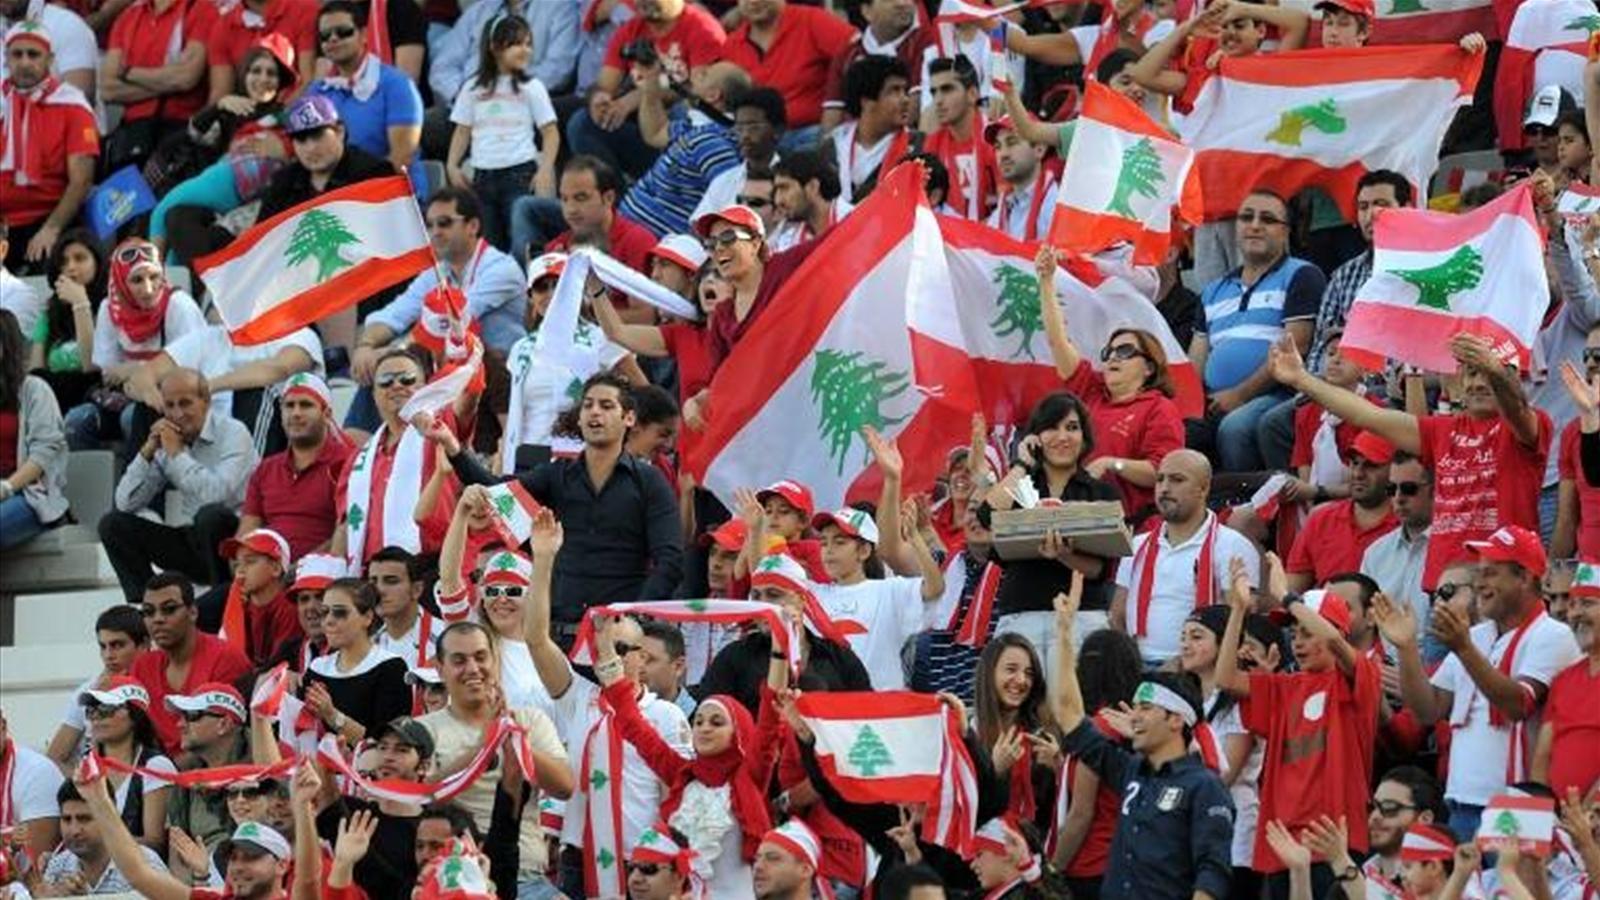 FIFA praises Lebanon for matchfixing response - World Cup 2018 - Football - Eurosport Australia